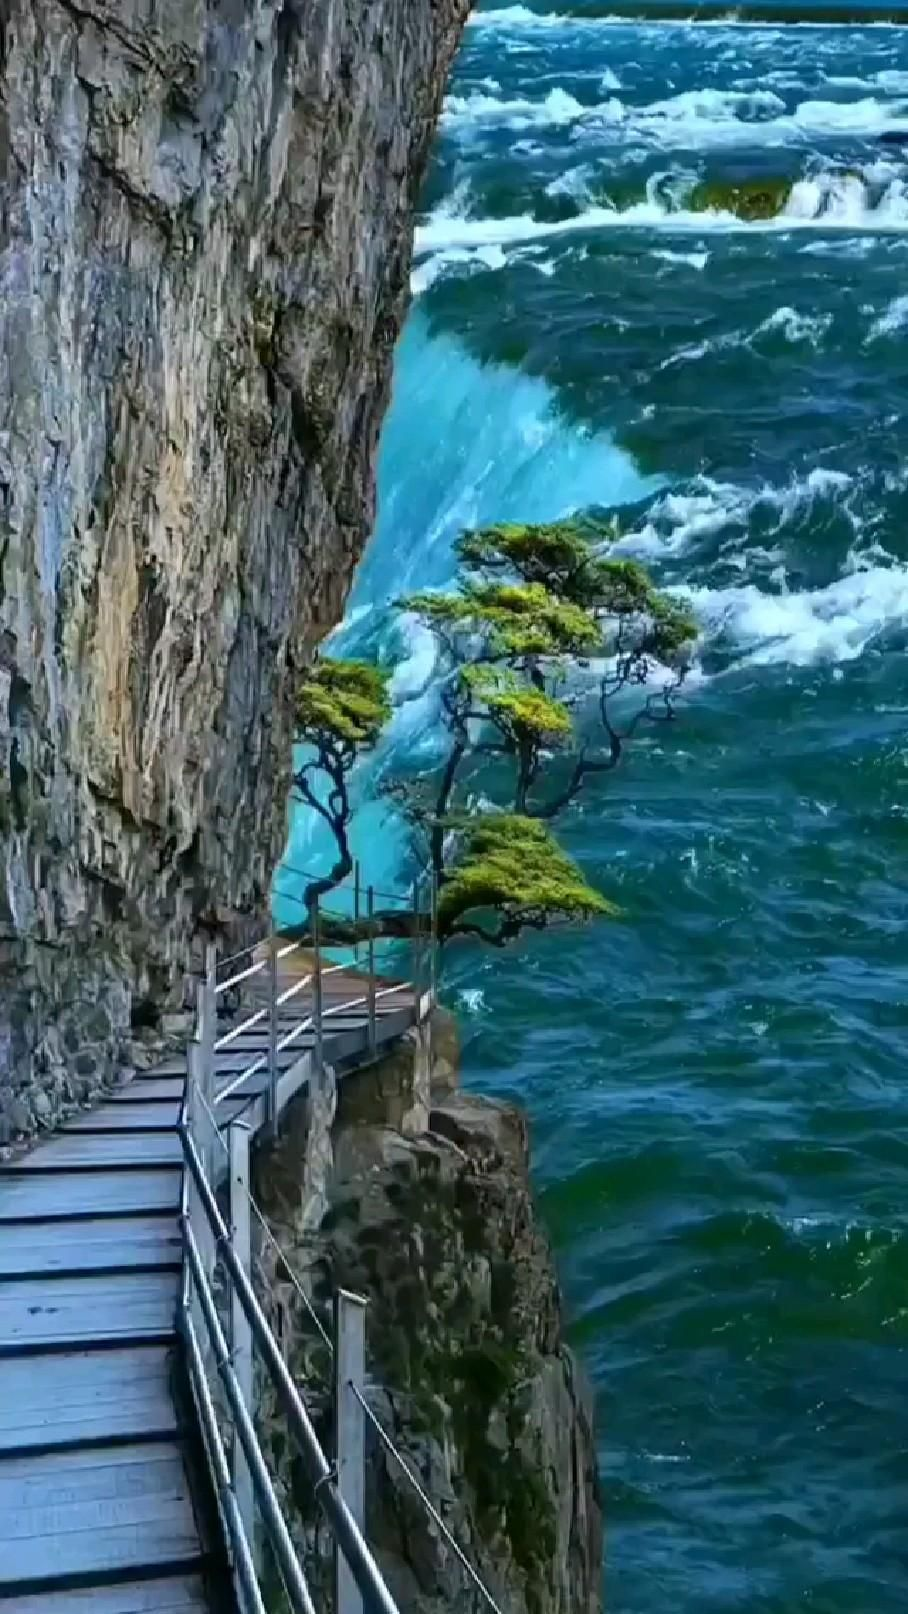 beautiful waterfall 😍